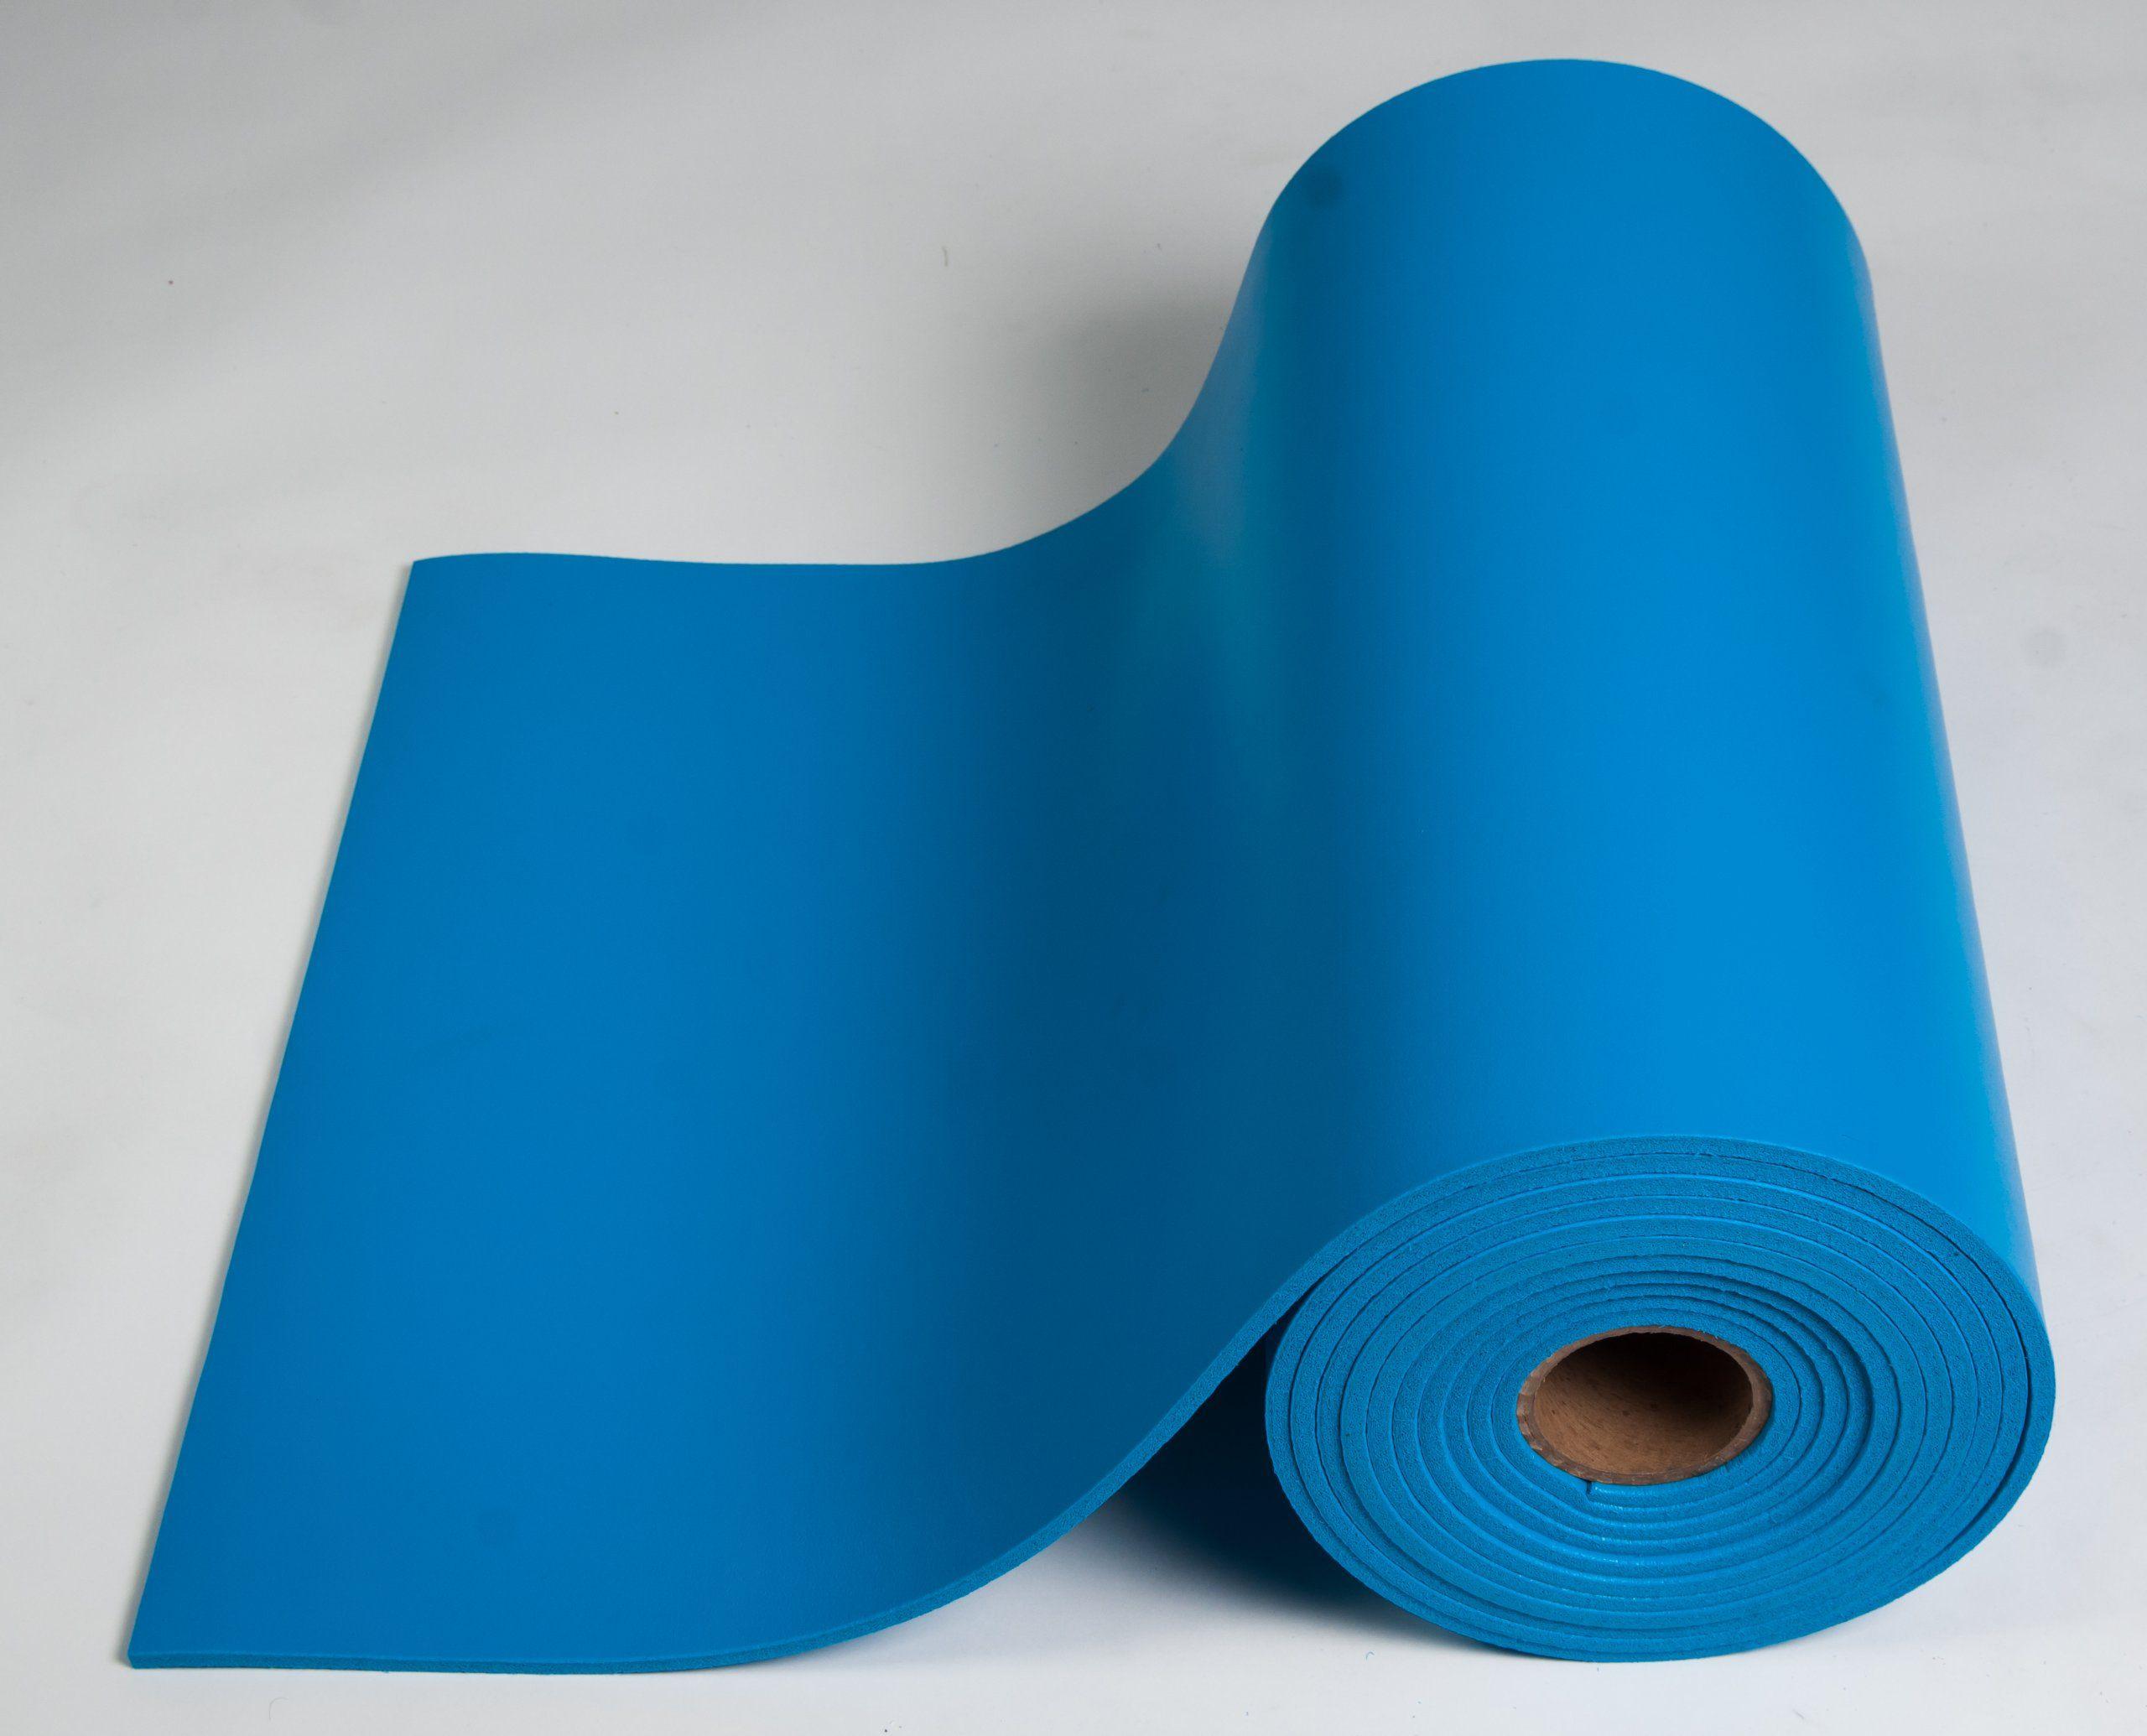 Esdproduct Pvc Foam Mat Roll 3 8 Thick 30 Length 2 1 Width Blue